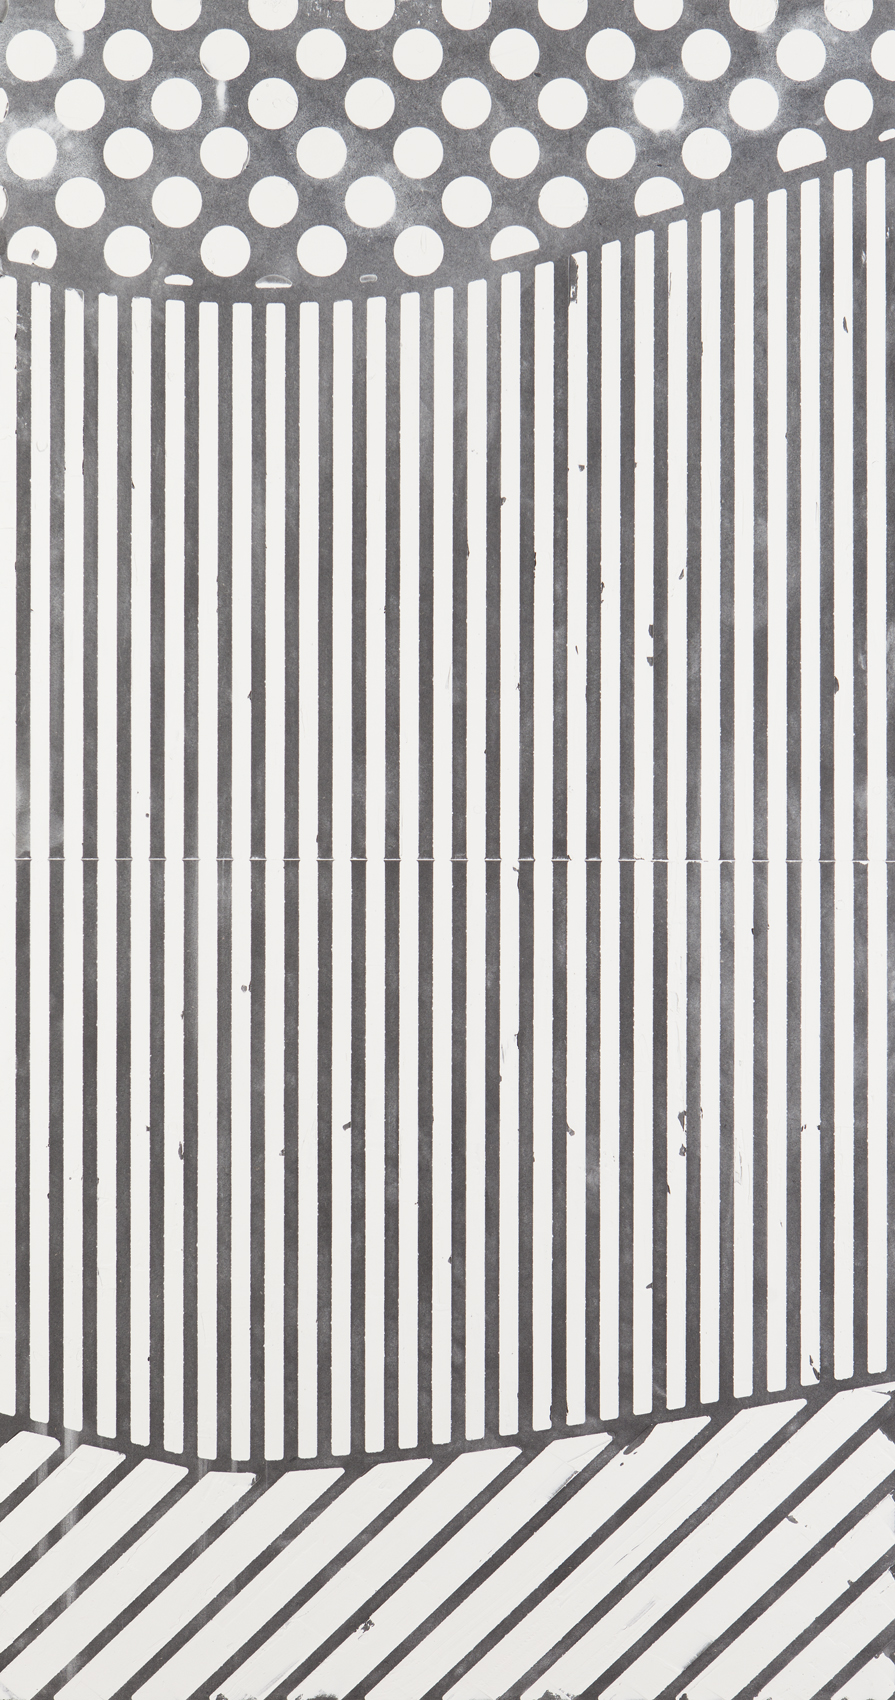 Untitled, 2016, Plaster on MDF, 150x80 cm (1).jpg